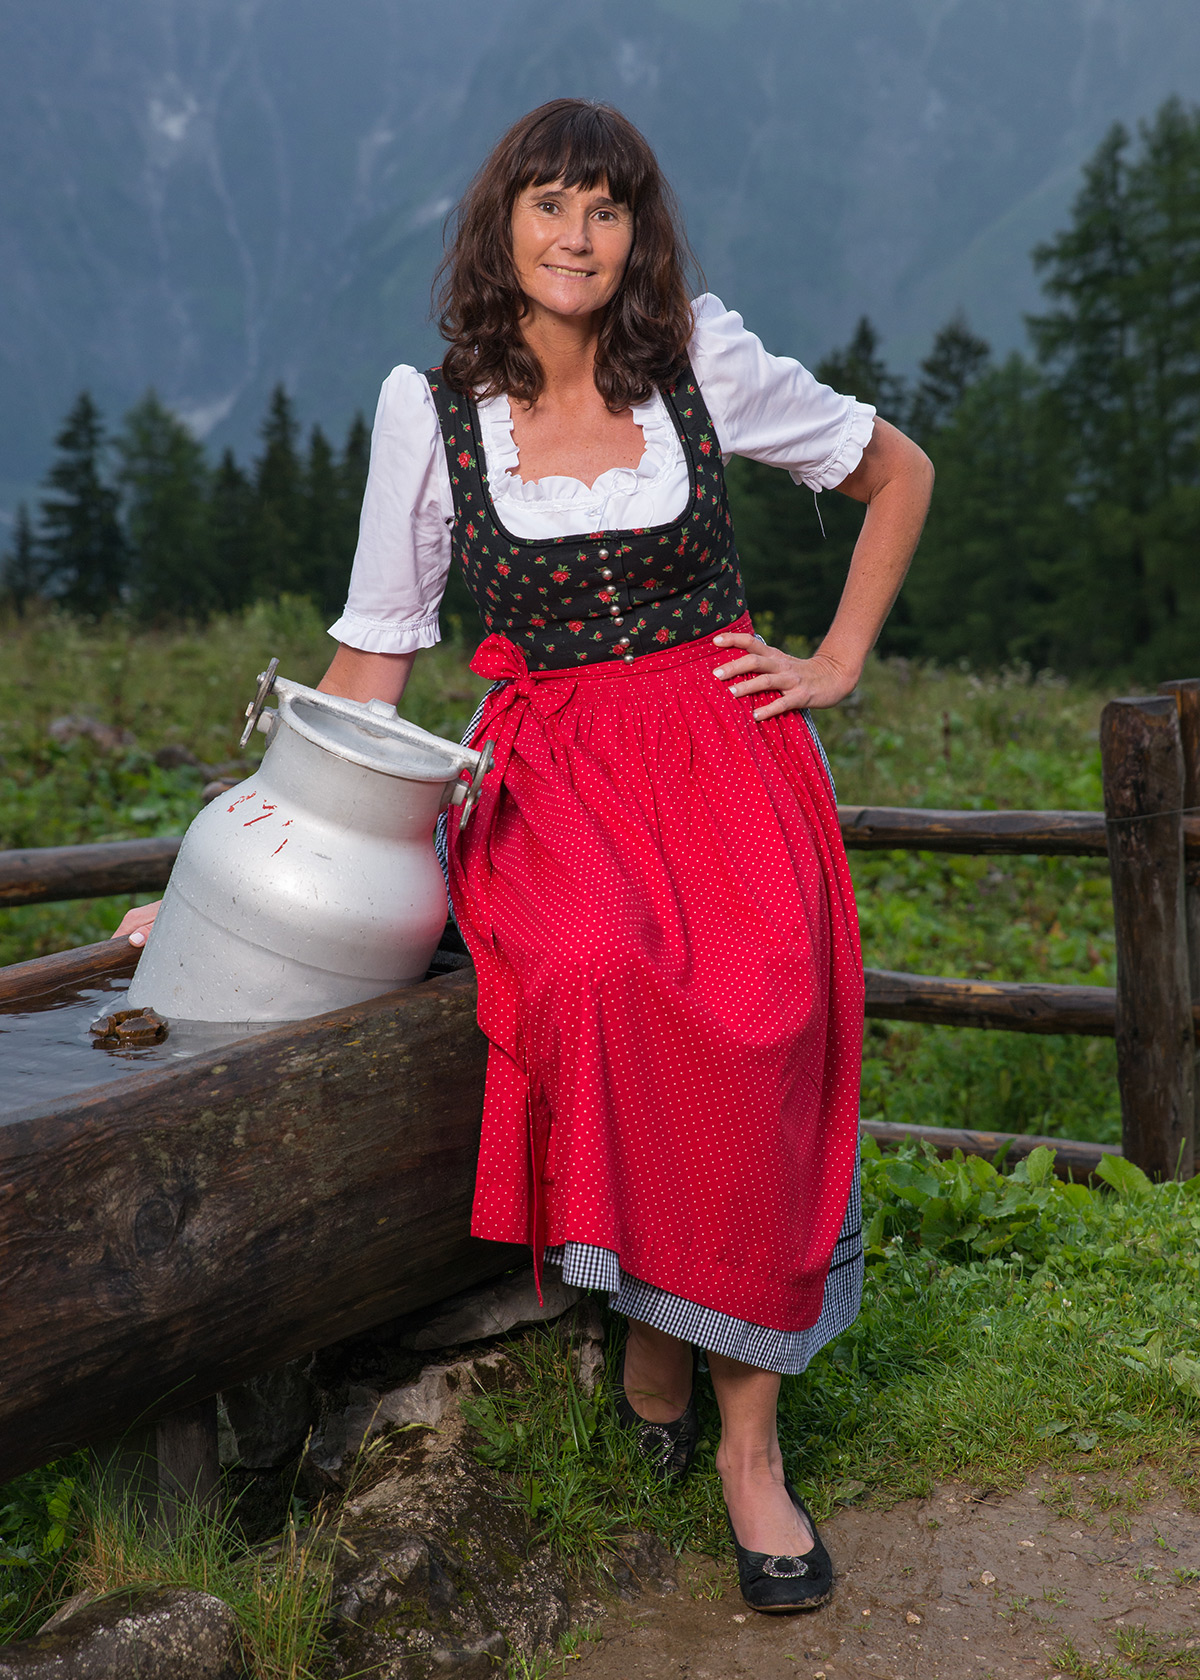 Sigrid Zörner